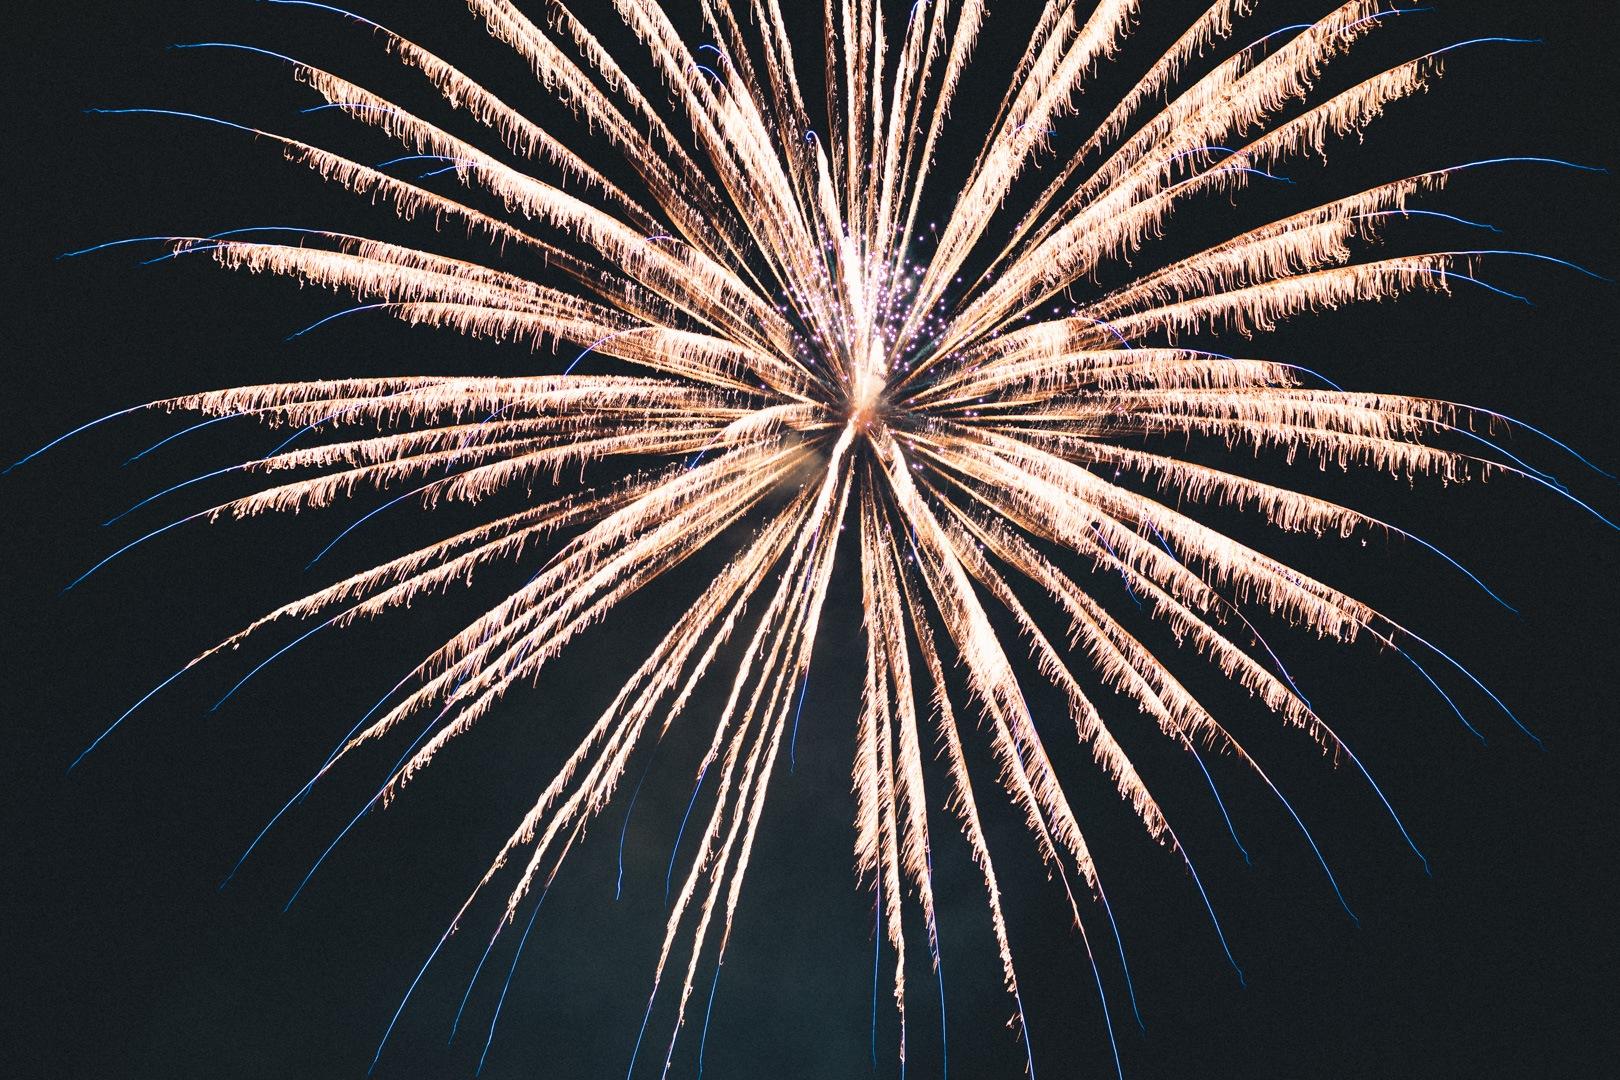 fireworks by sarah fidai